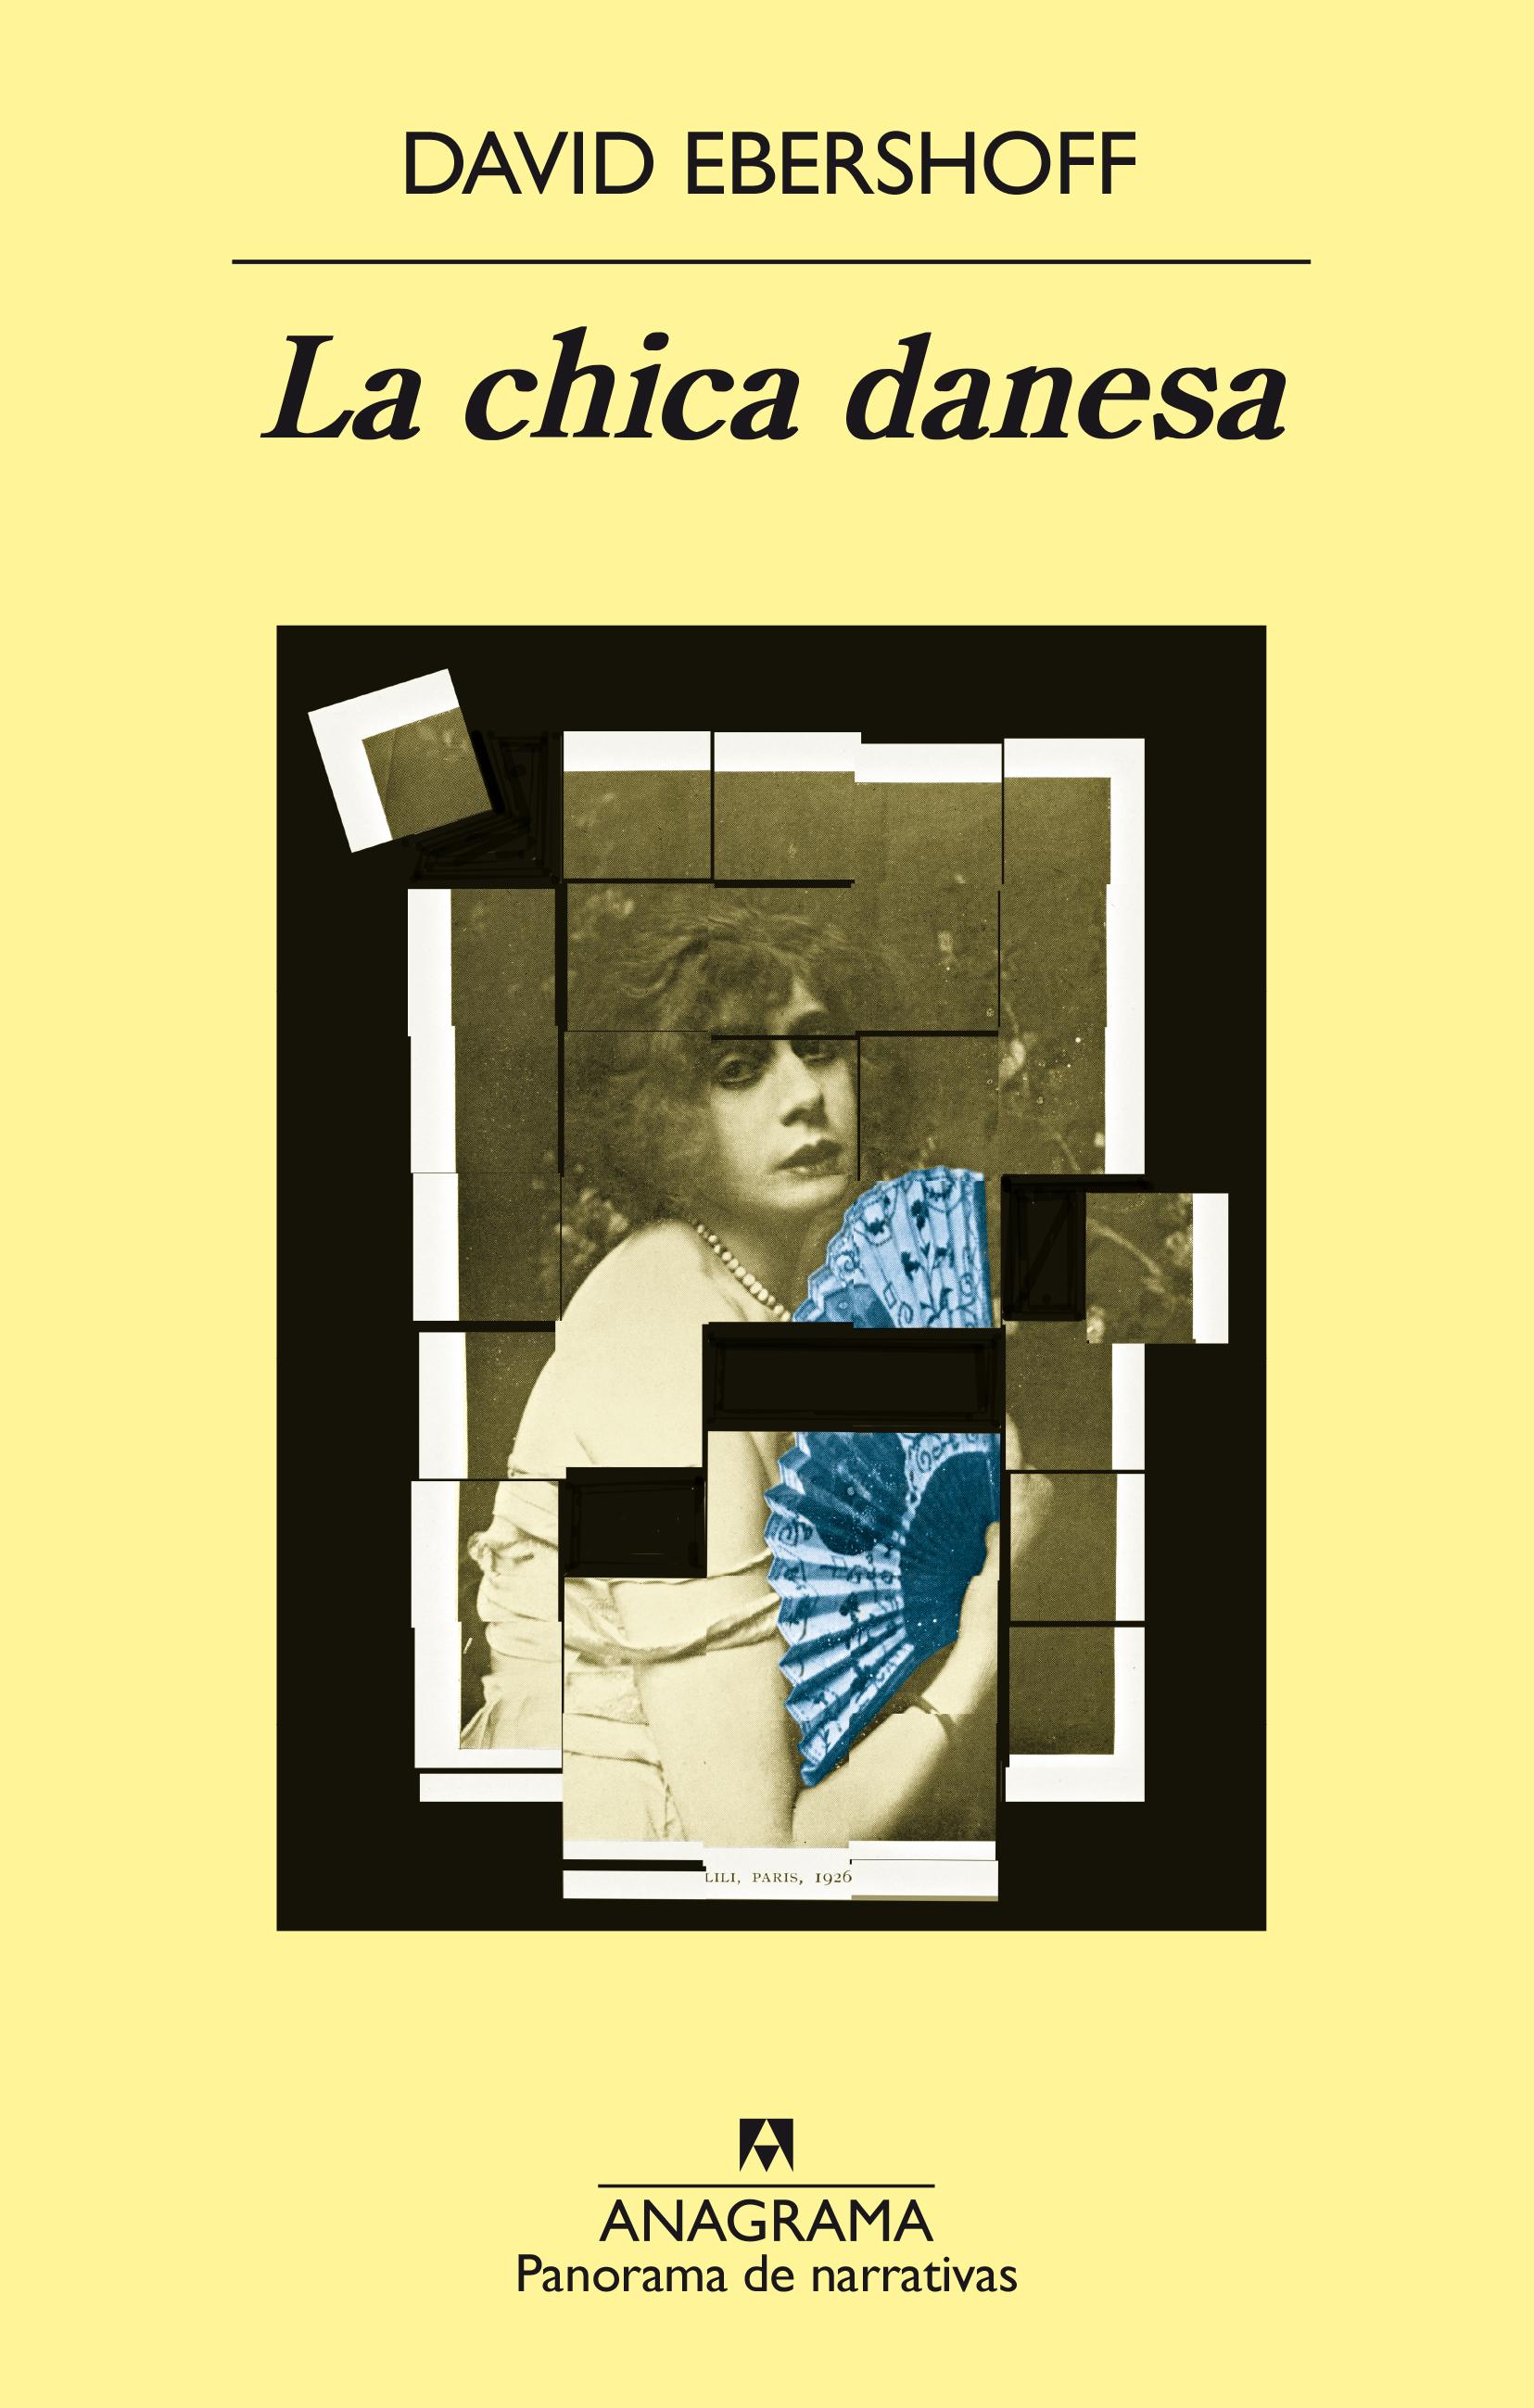 La chica danesa - Ebershoff, David - 978-84-339-6937-8 - Editorial ...